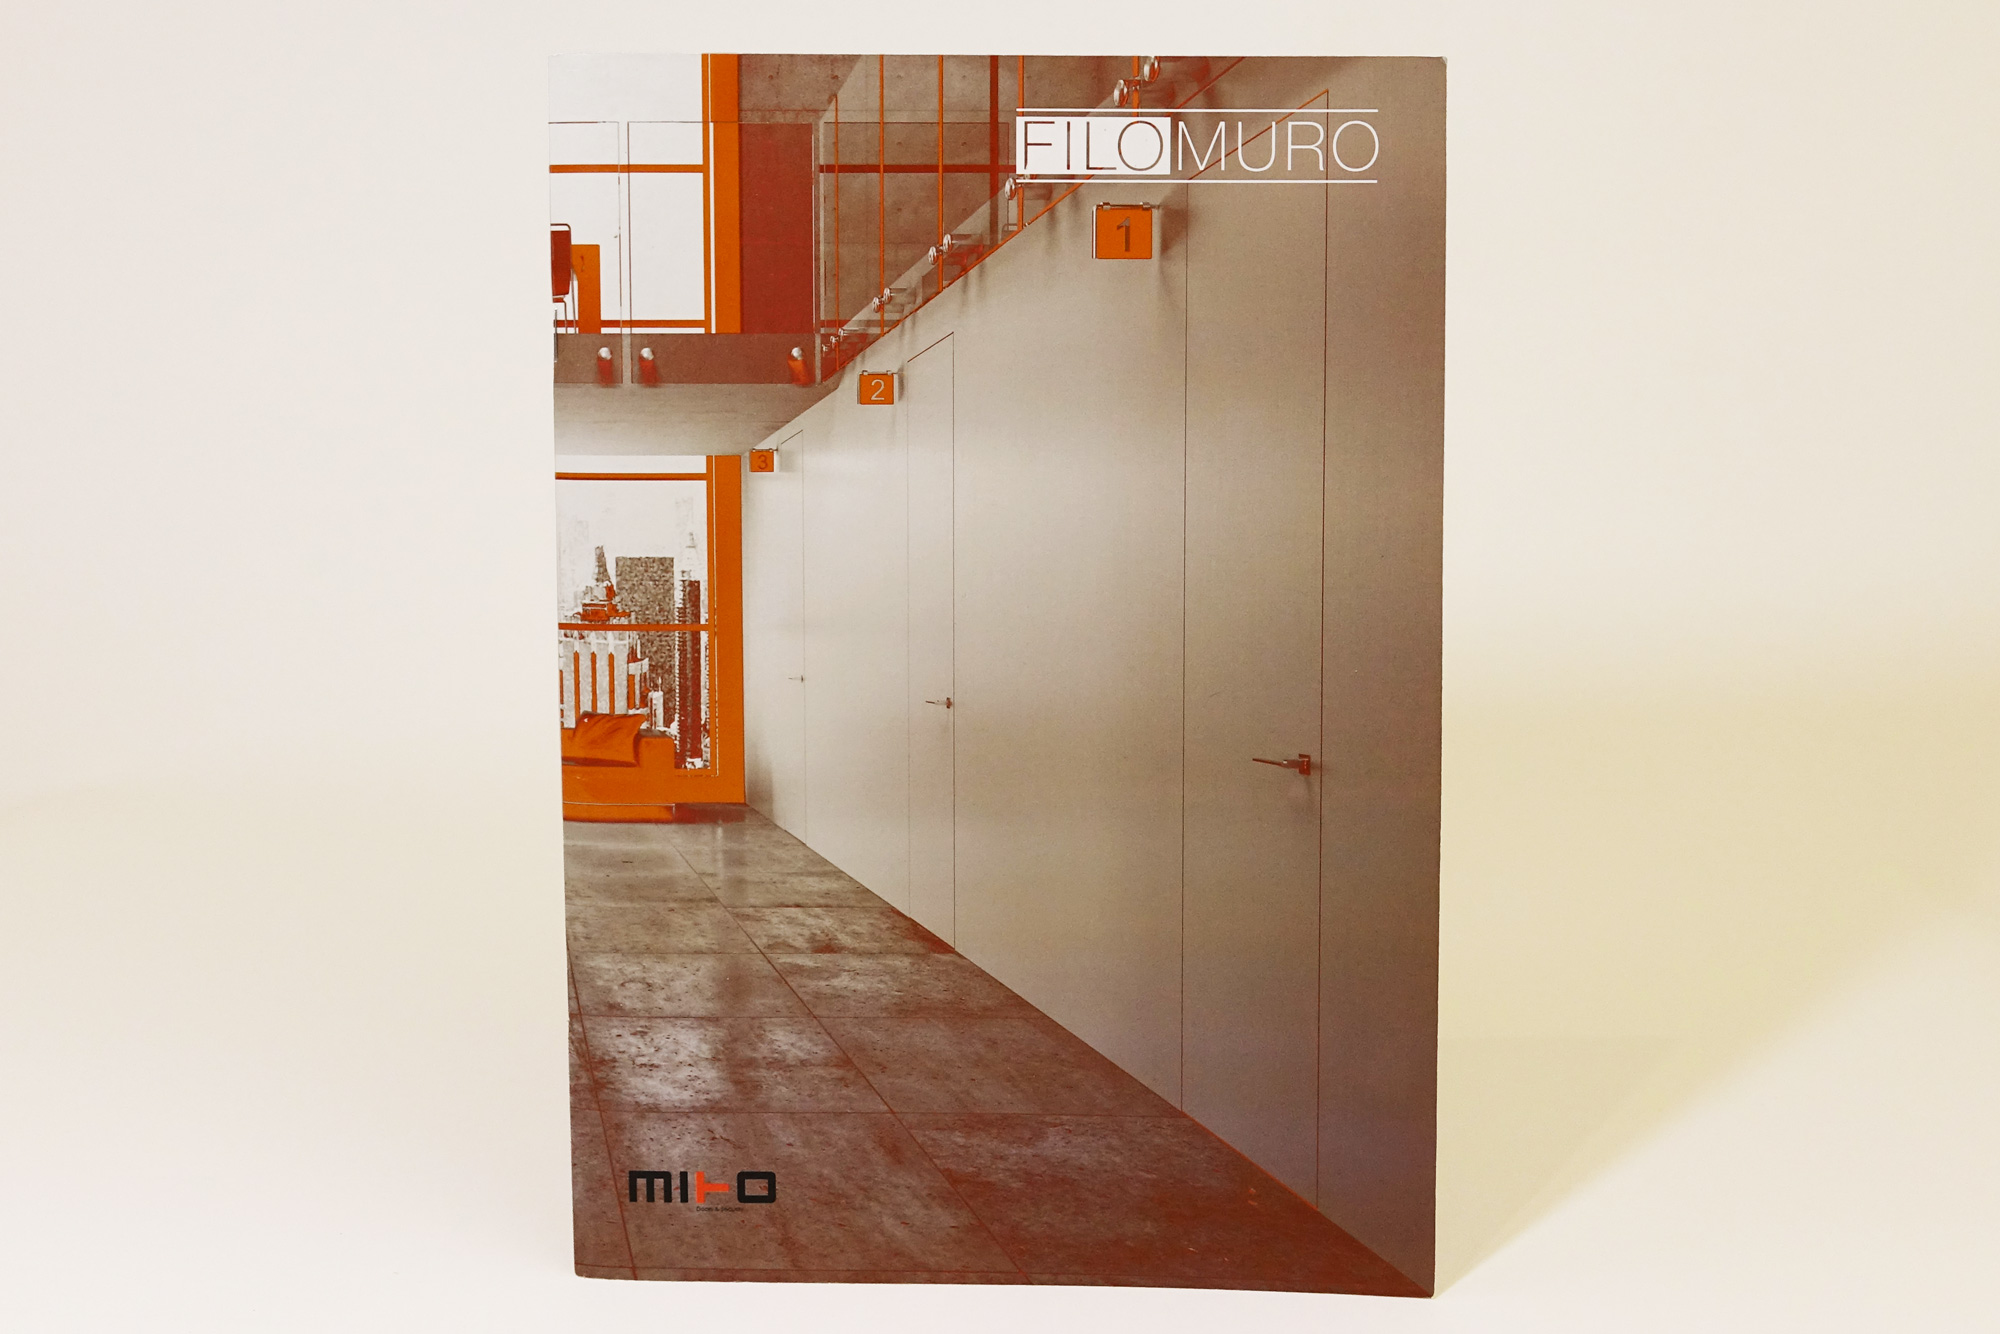 studio bartolini cataloghi grafici rendering 3D Filomuro doors security catalogo porte maniglie inferiate ante chiudiporta Tavullia Pesaro Urbino